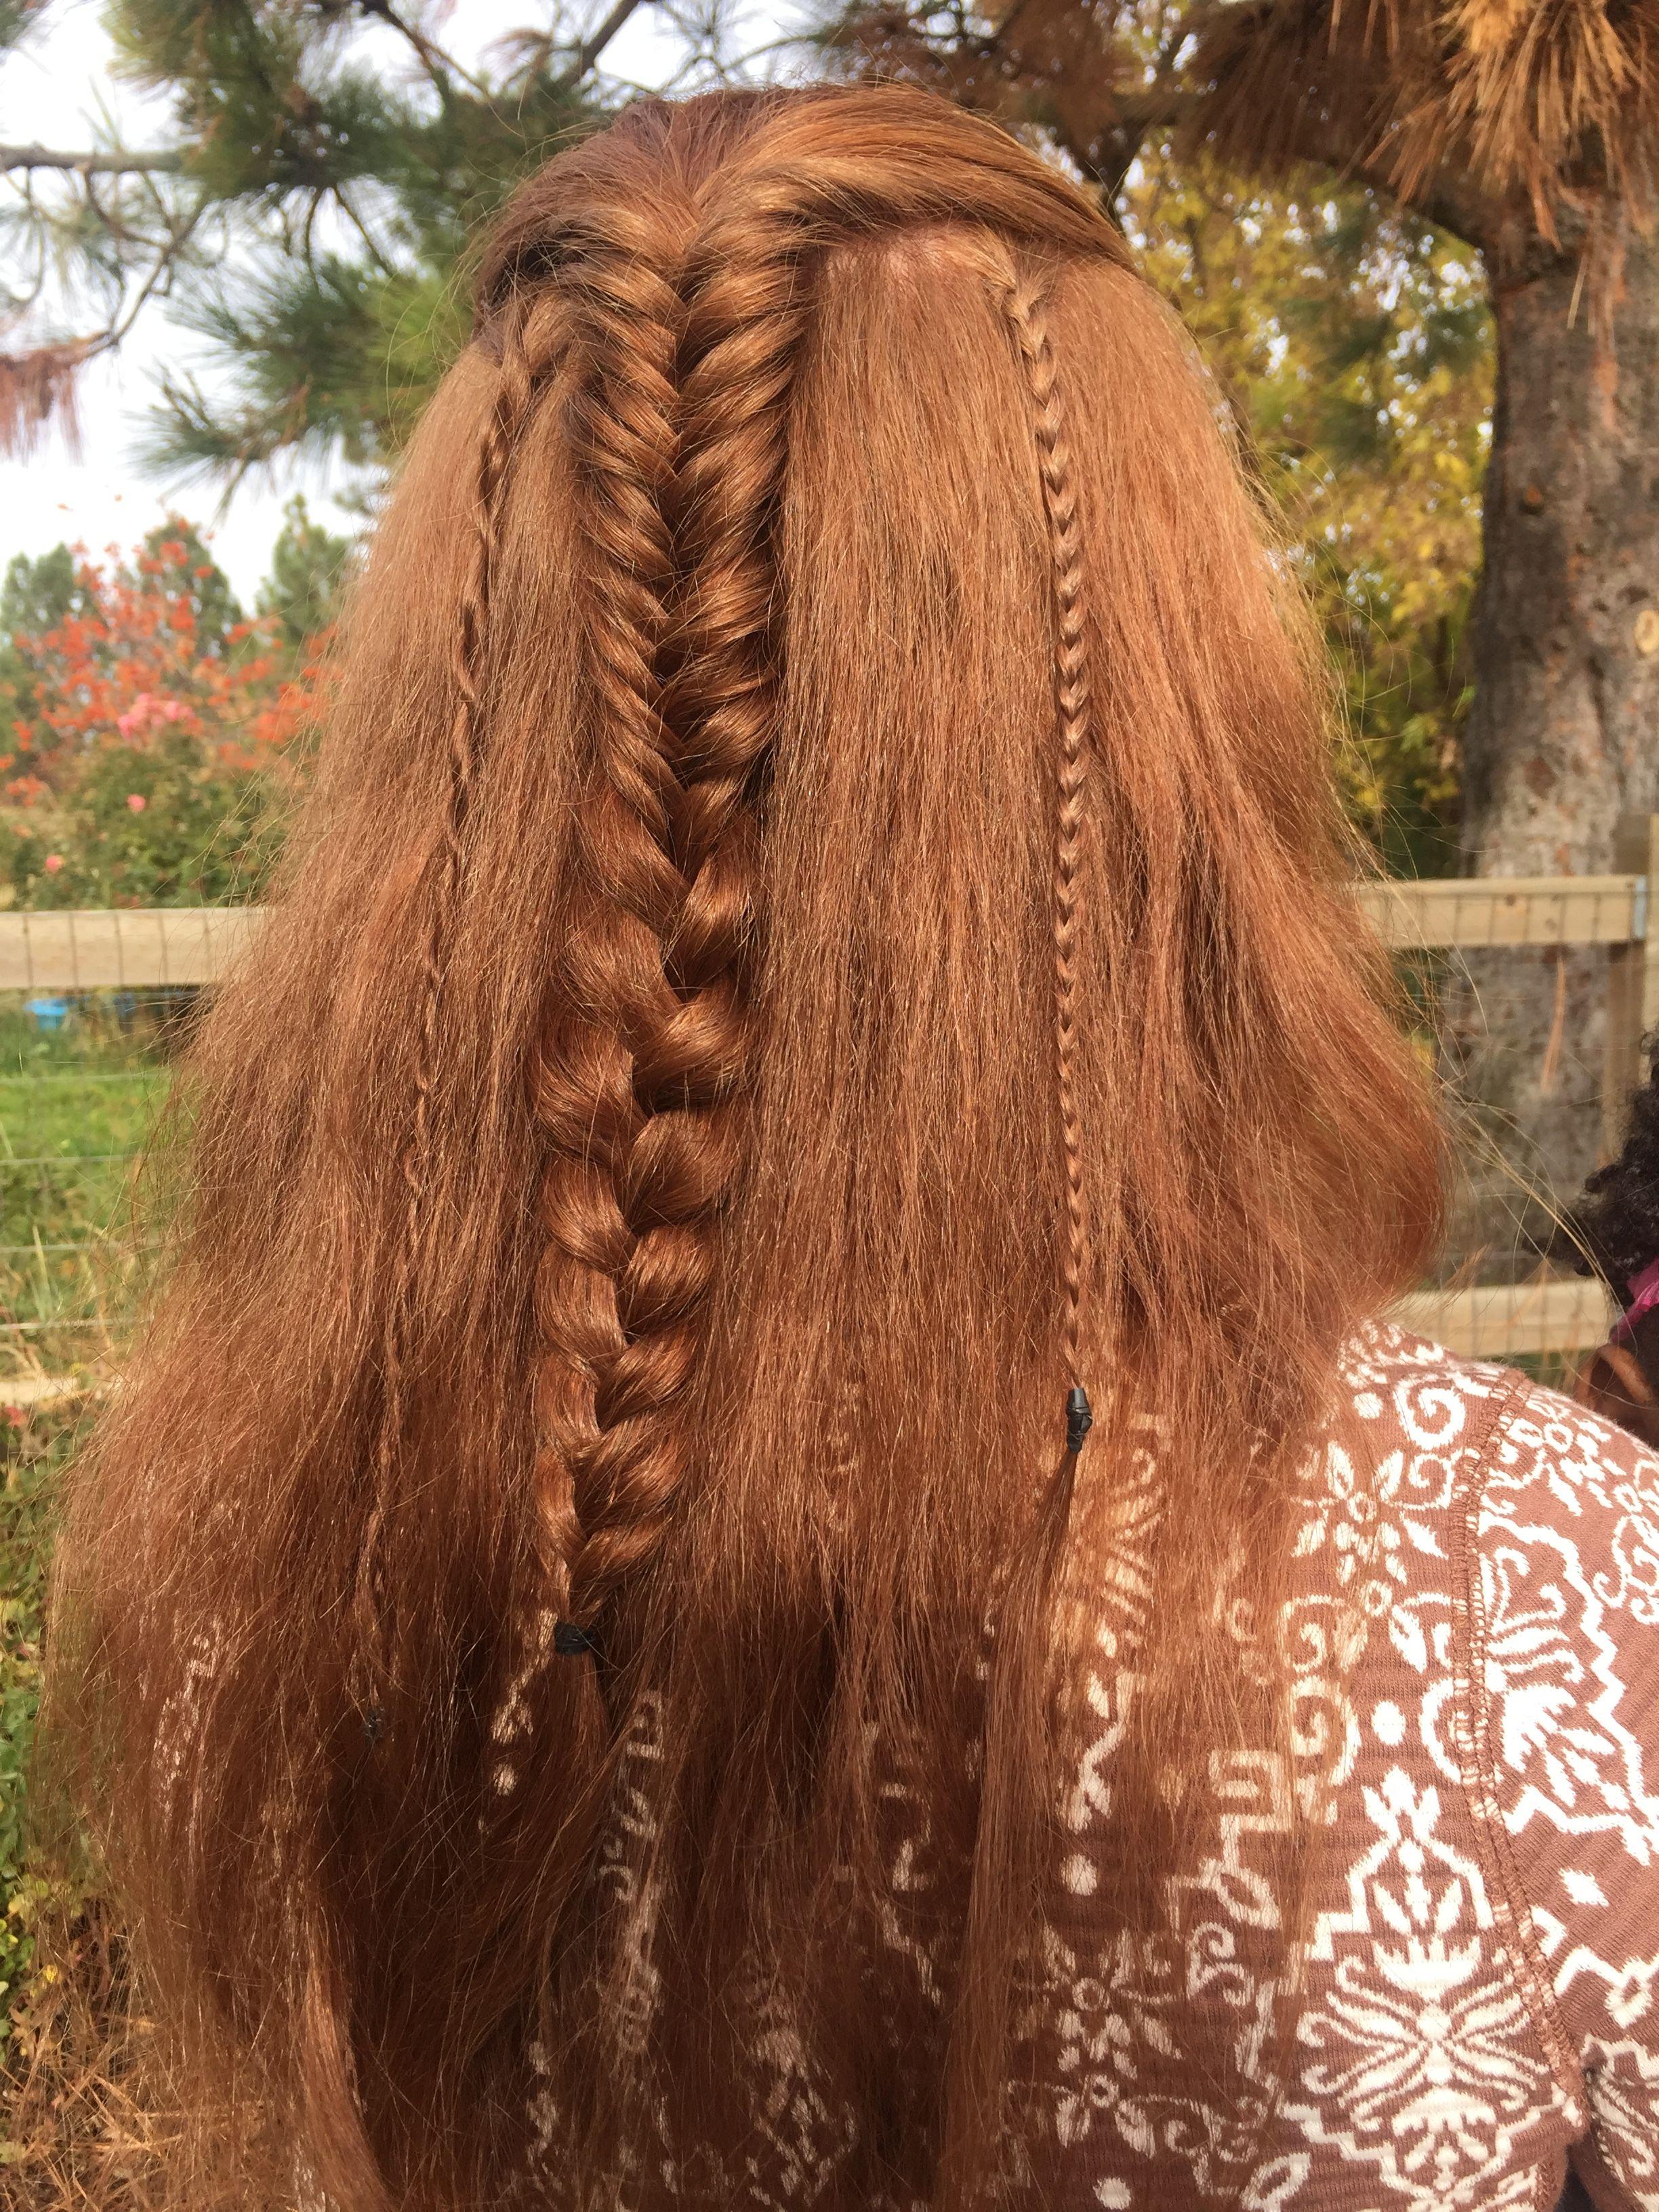 Pin de •elenor• en legolas' hair   Peinados